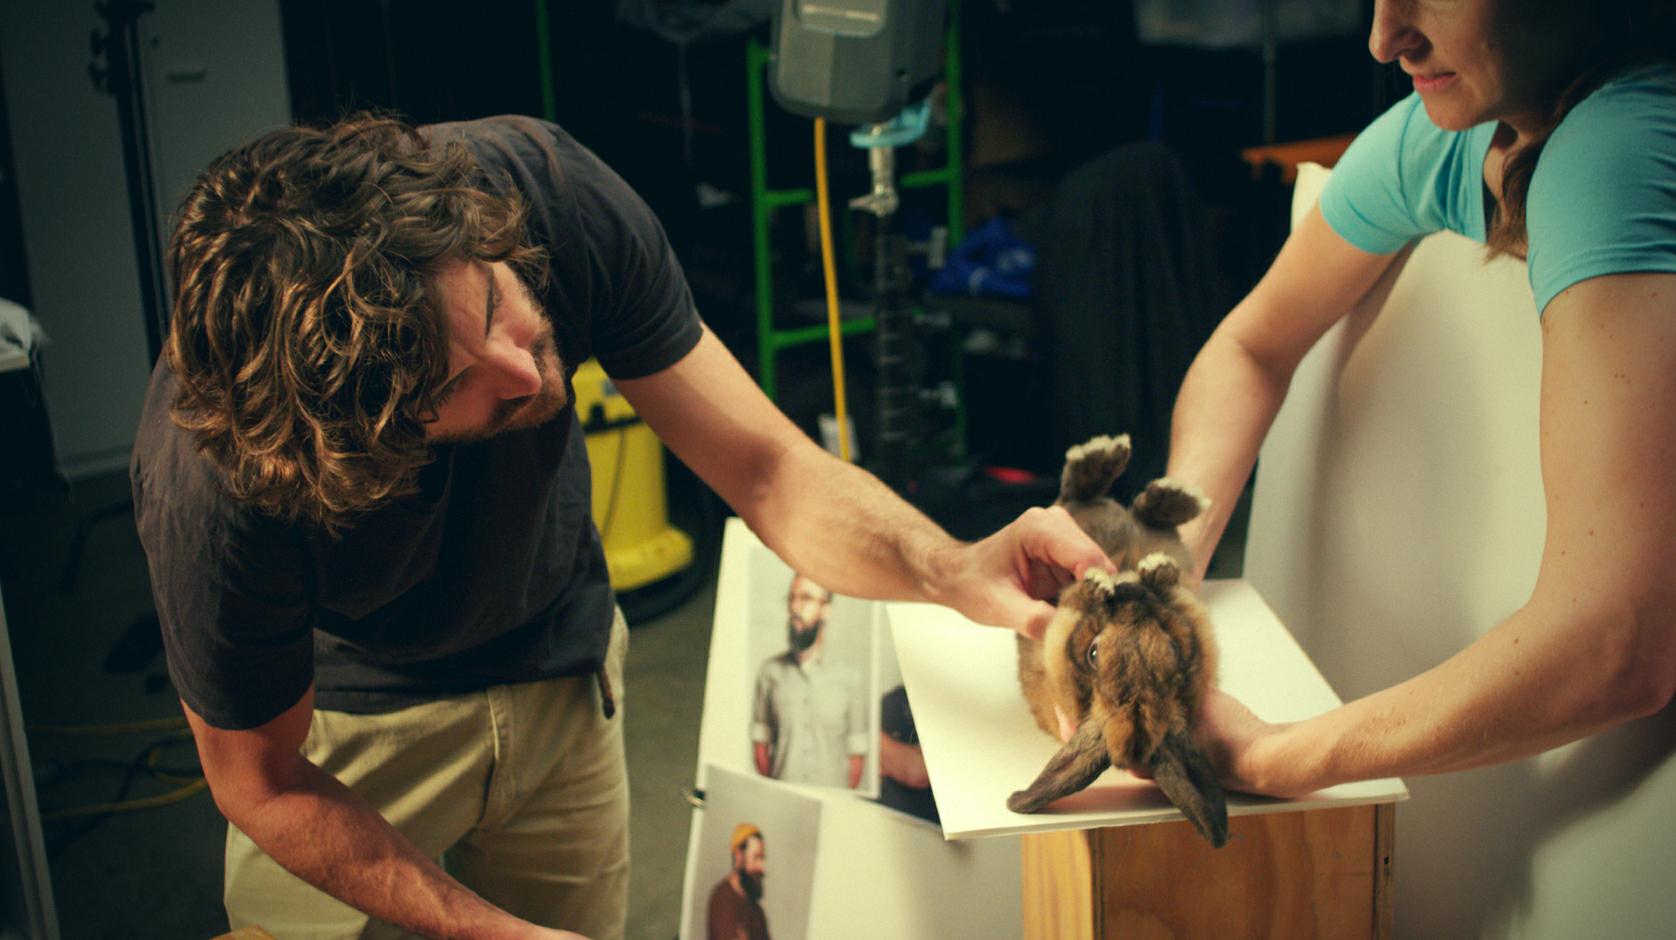 Senior Retoucher Inness Robins directing our model 'Bunny'